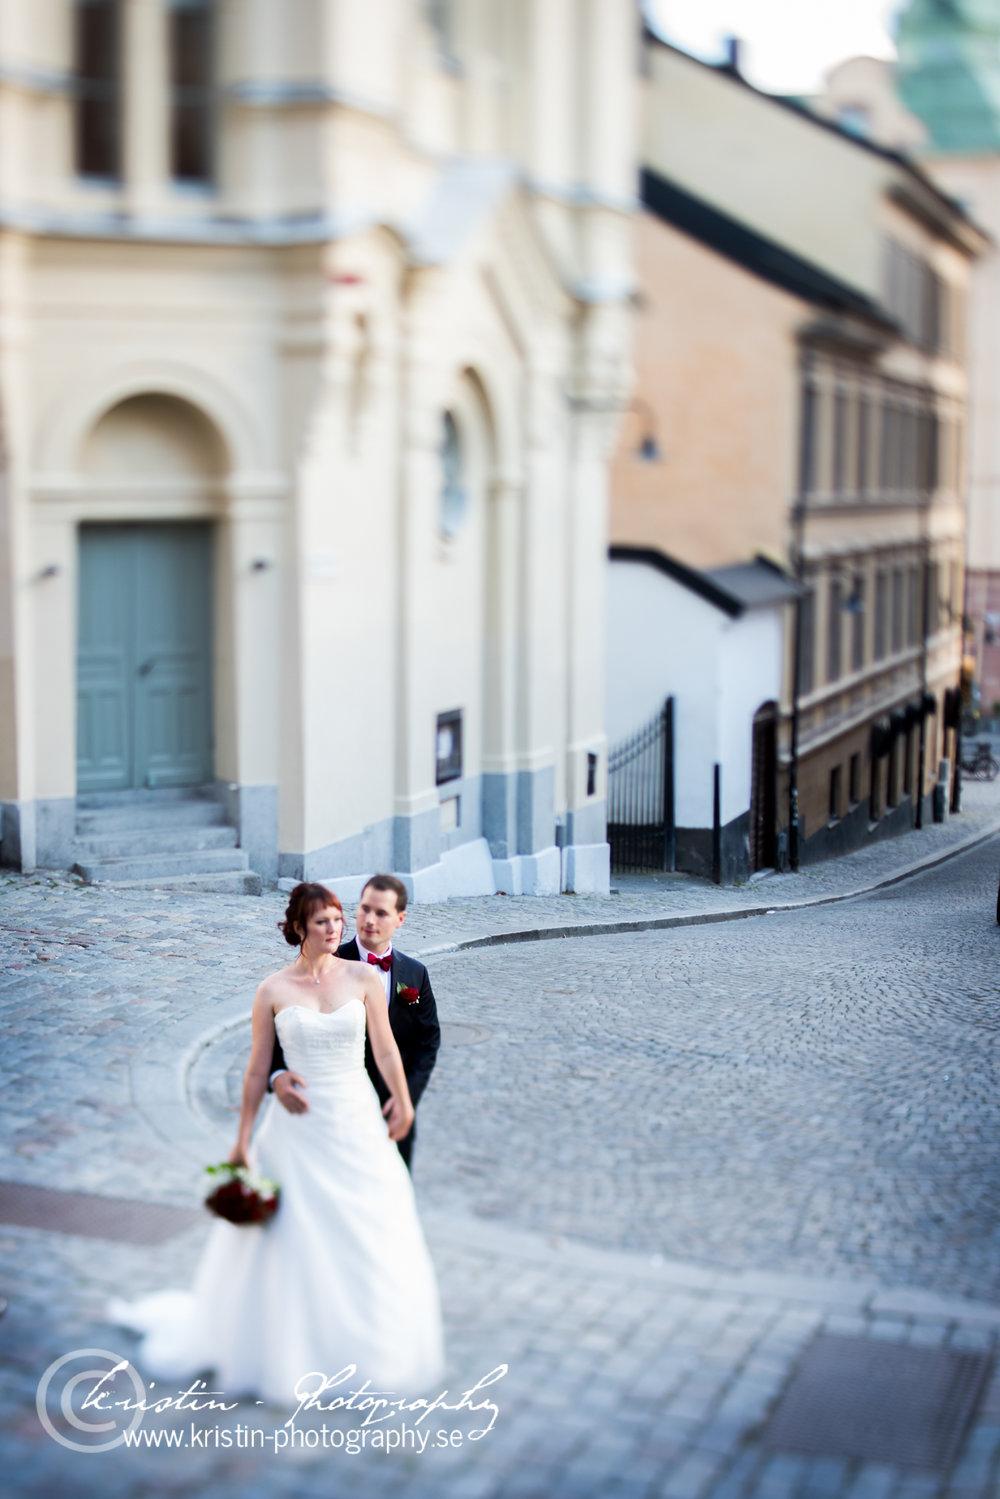 Bröllopsfotograf i Stockholm, Kristin - Photography , Munchen Bryggeriet-229.jpg